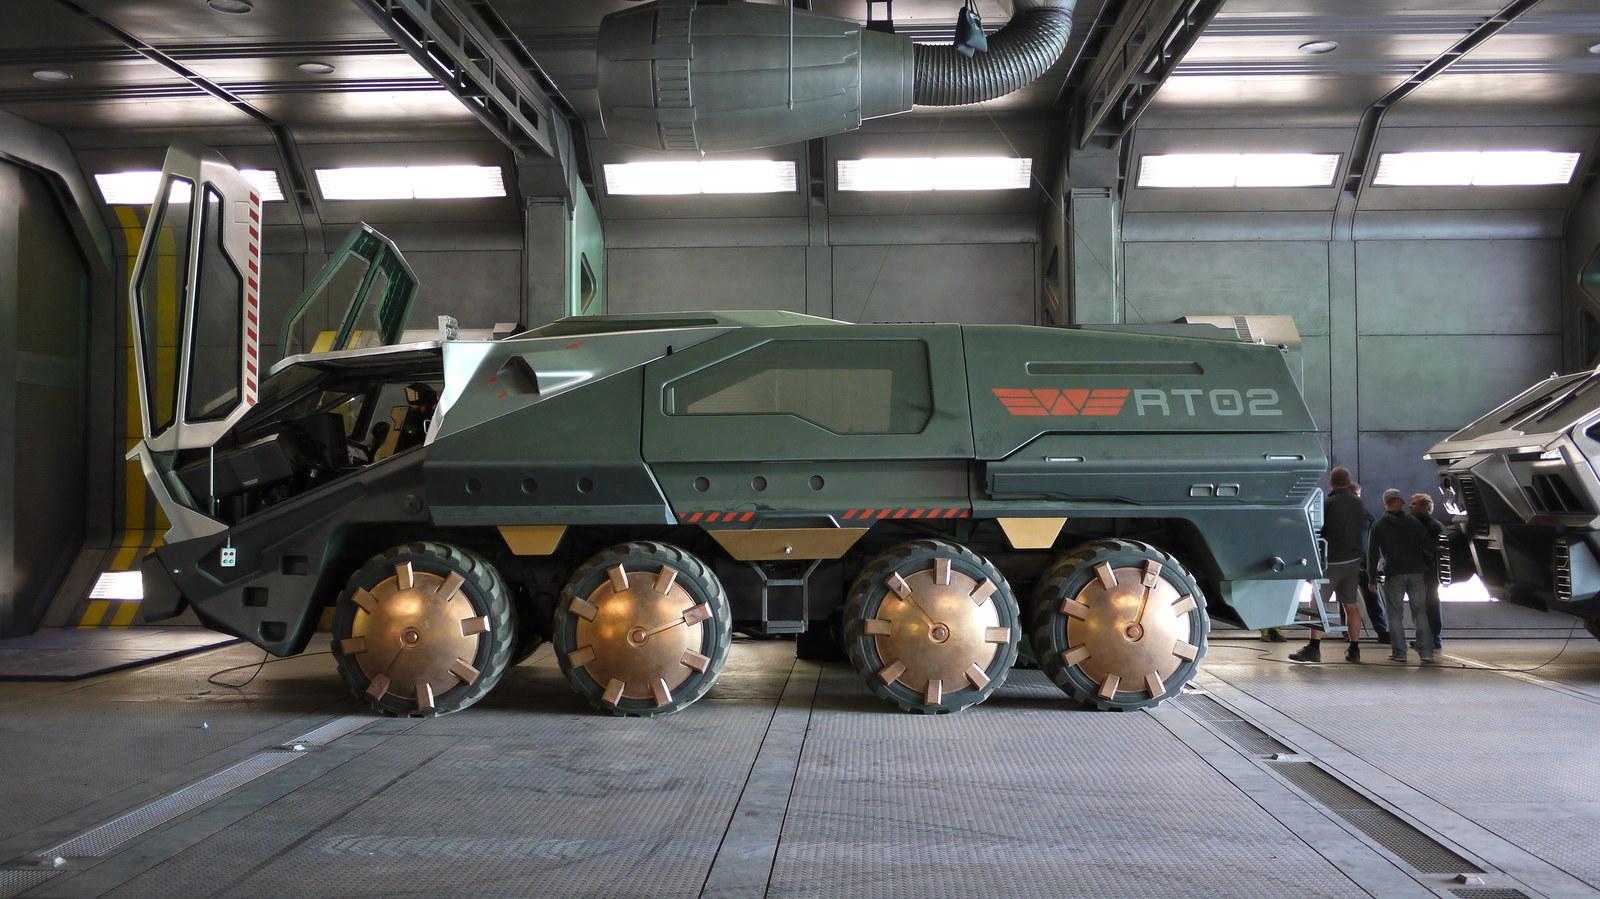 prometheus+rt+transport+vehicle+01.jpg